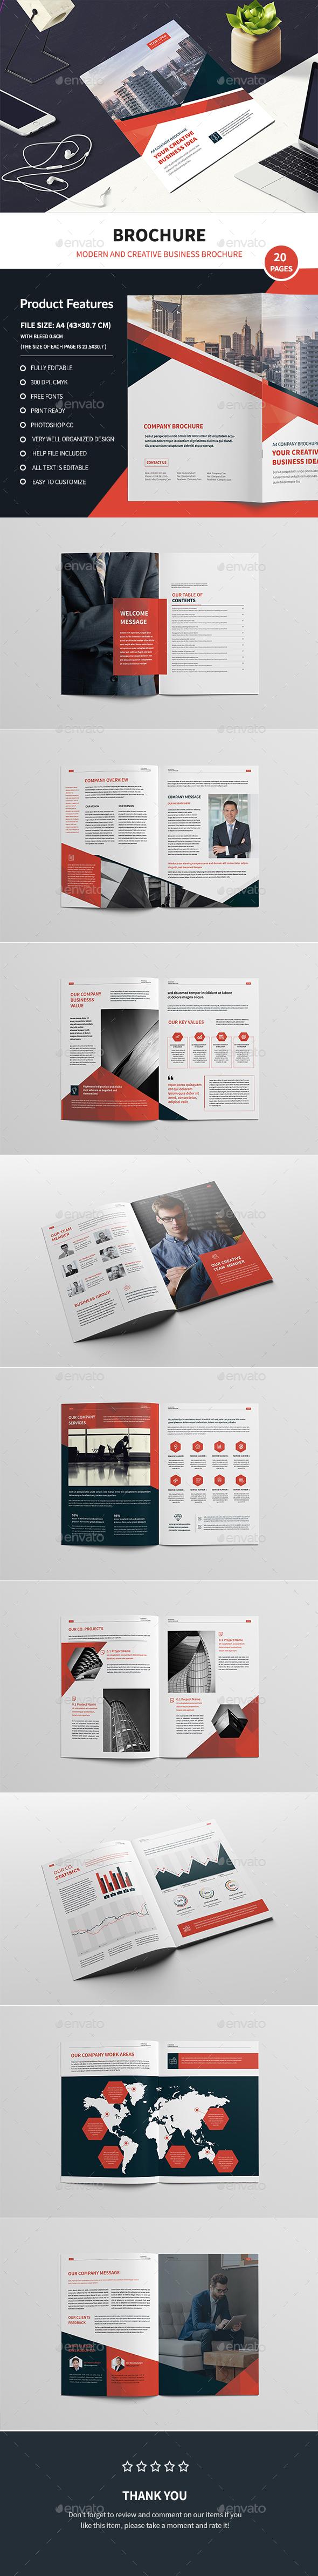 GraphicRiver Corporate Business Brochure 20809279